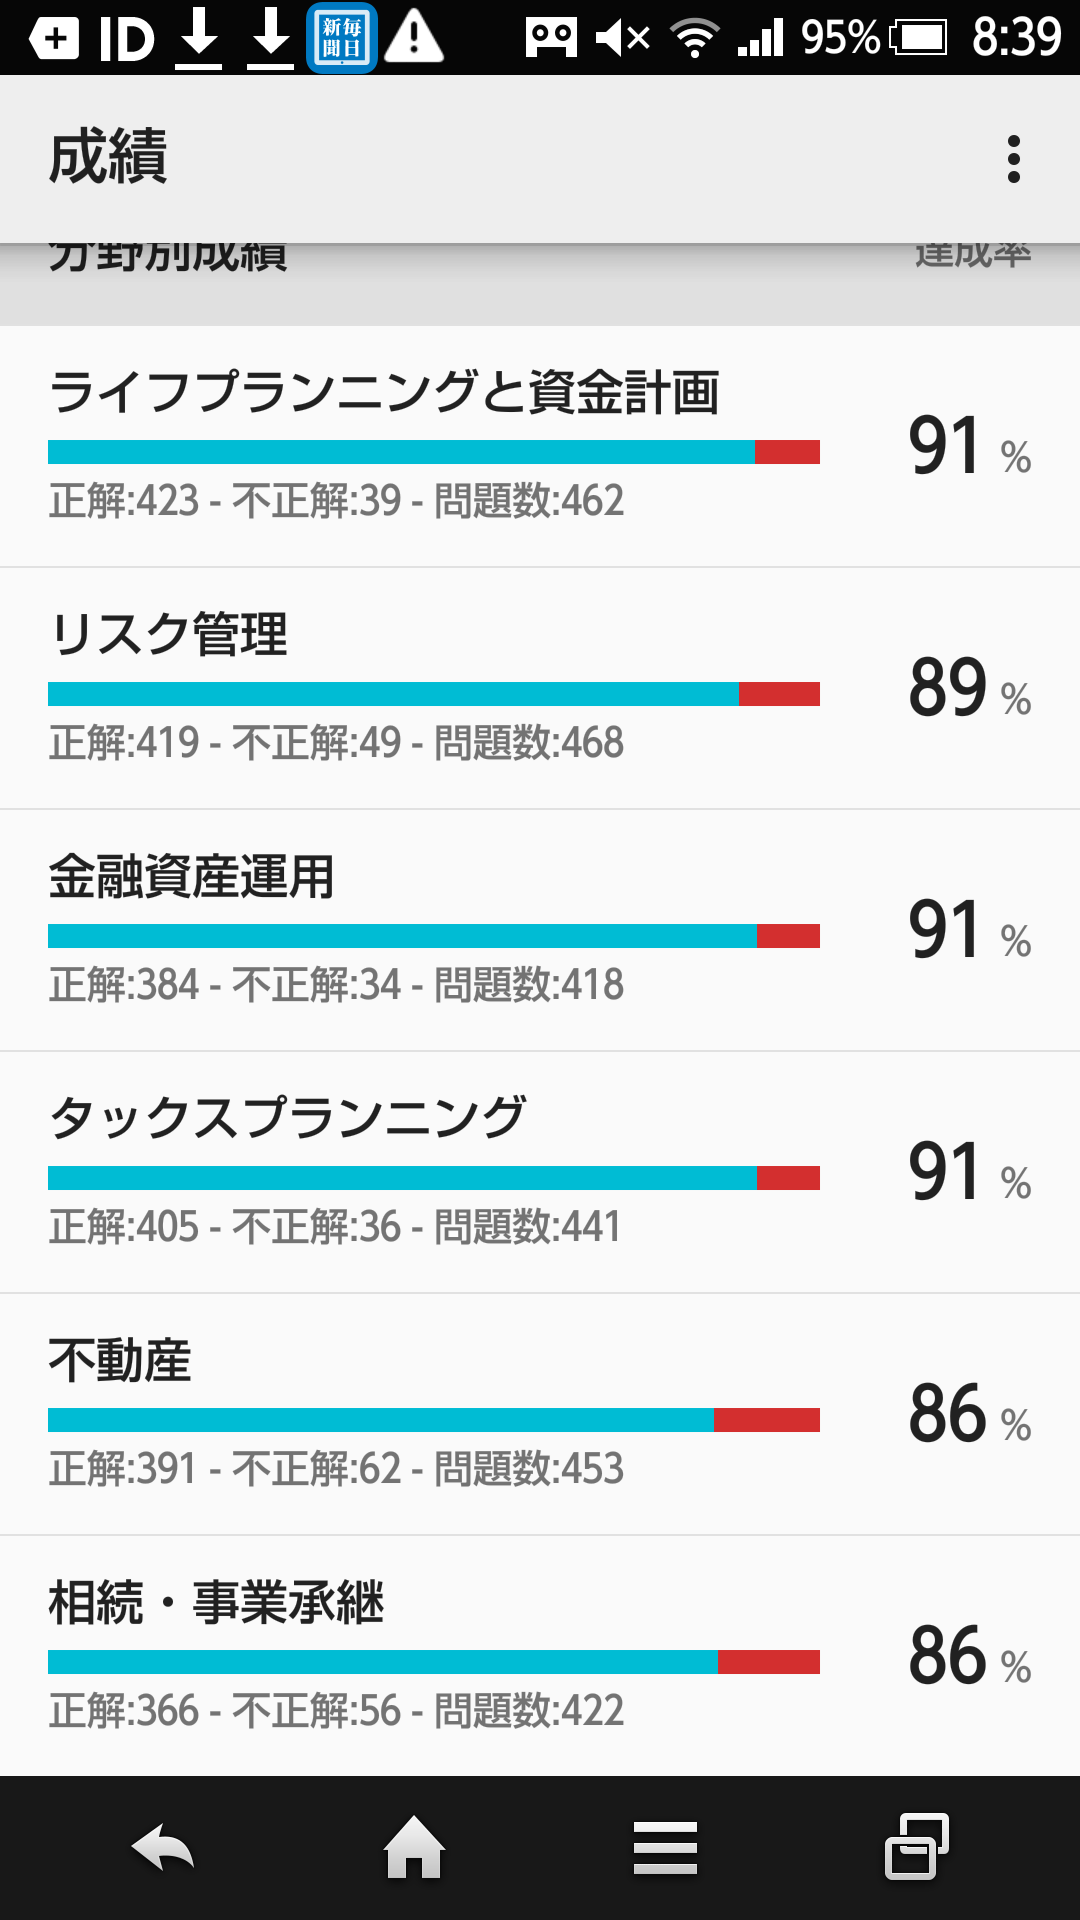 Screenshot_2016-05-22-08-39-46.png